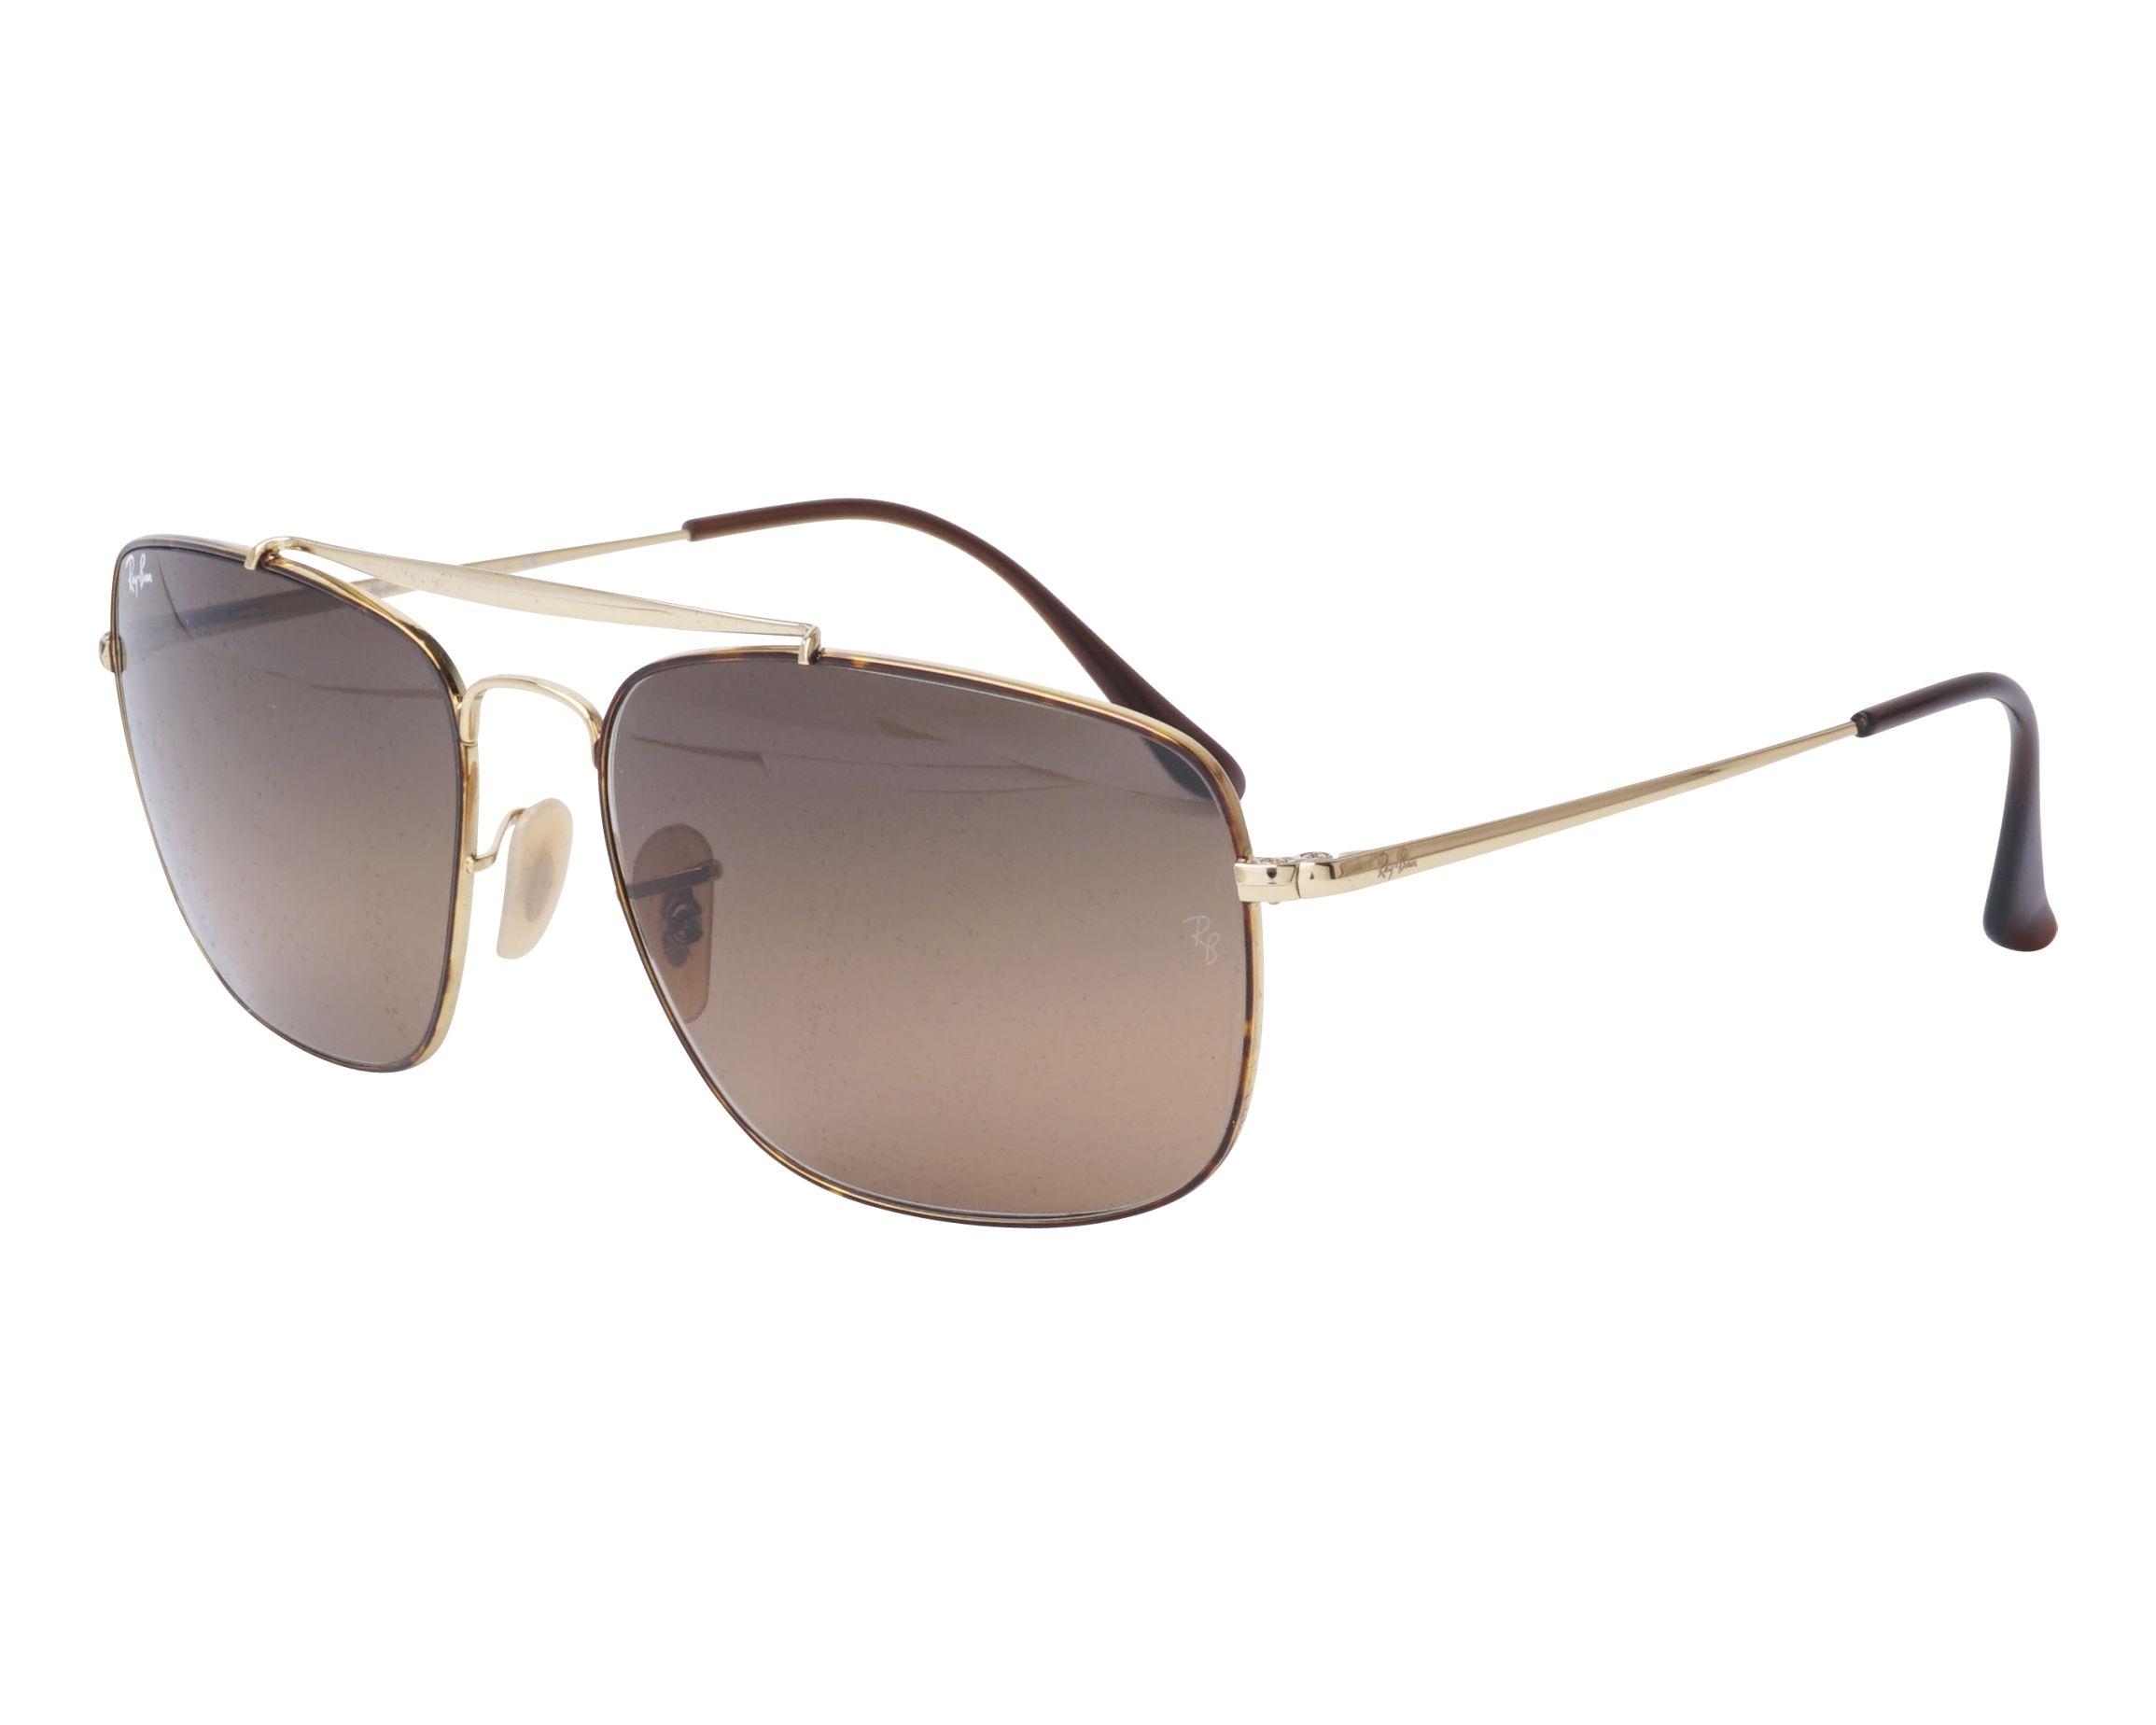 f8139aea932 Sunglasses Ray-Ban RB-3560 910443 58-17 Gold Havana profile view